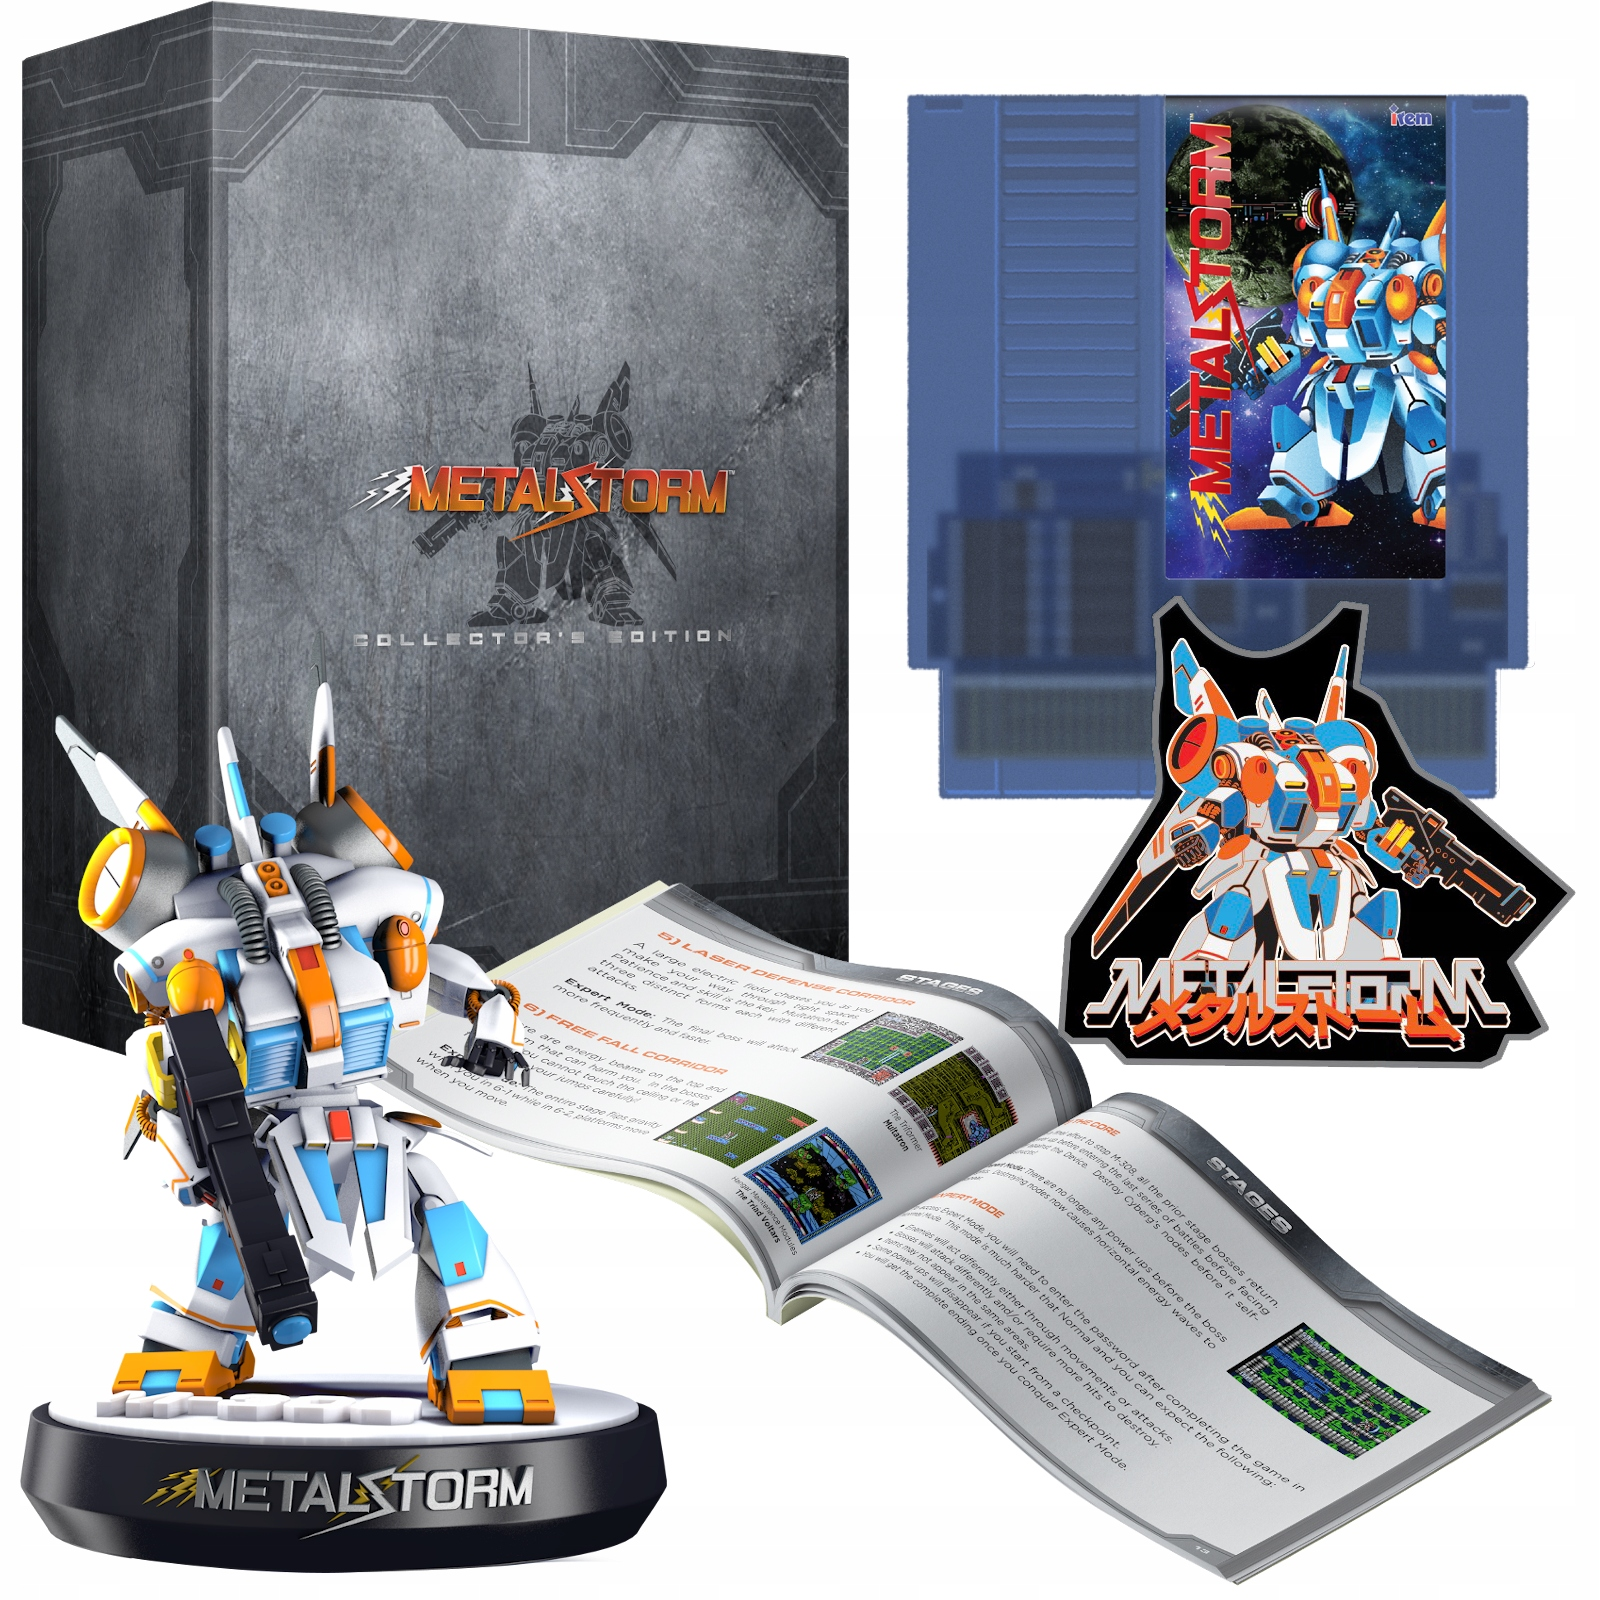 Metal Storm Collectors with figure, NES EU Premiere